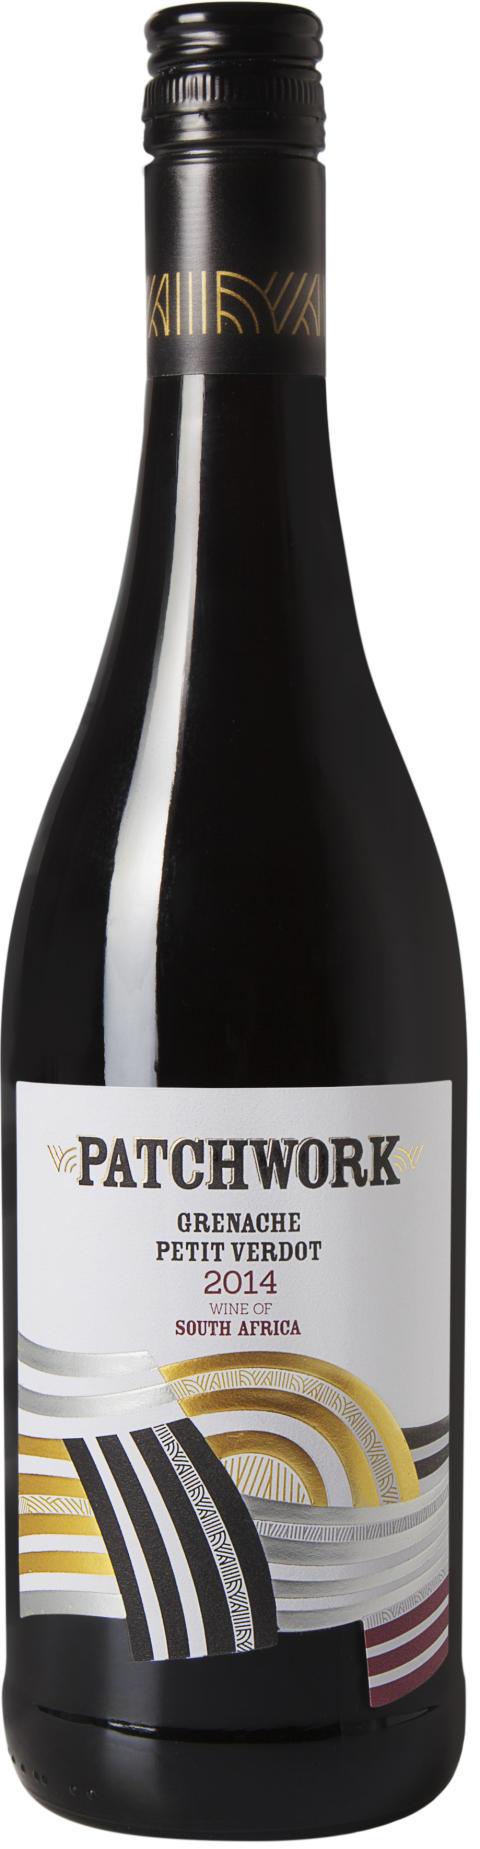 Patchwork Grenache Petit Verdot, flaskbild